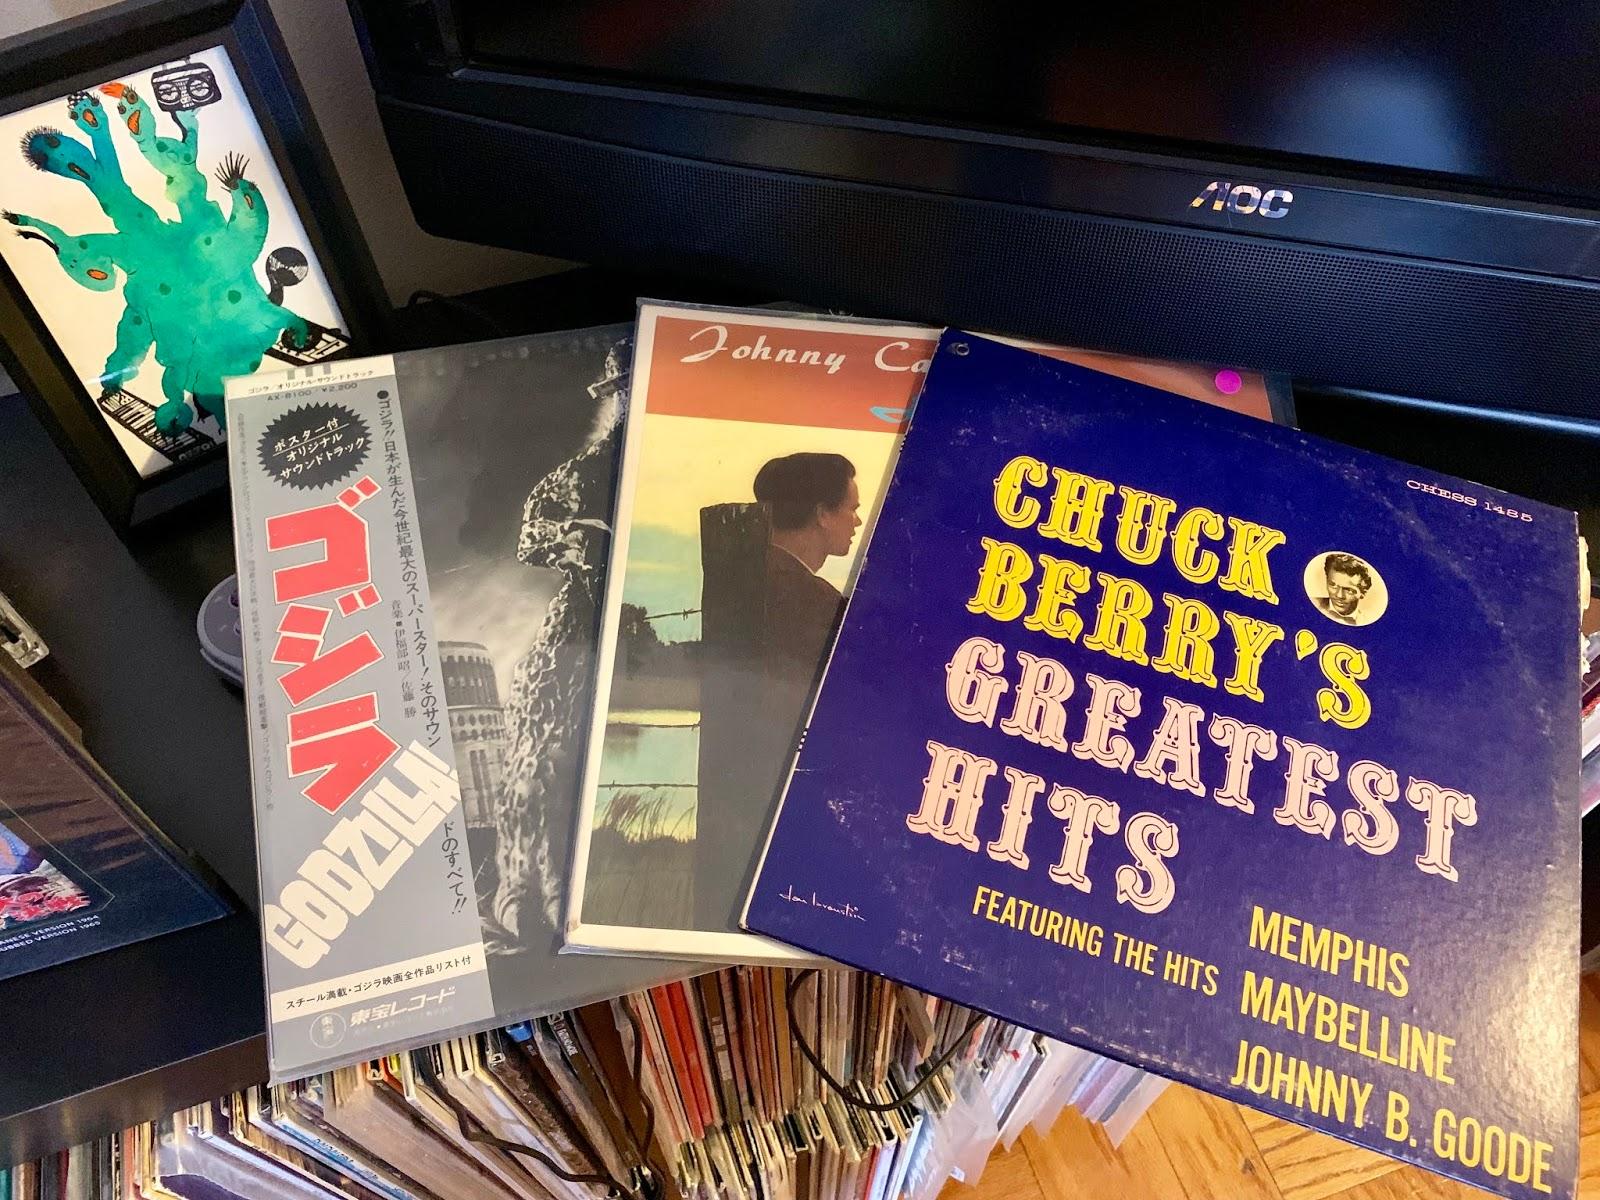 Karaoke Cd+g Legend Series 17 Tracks Neil Diamond #2 Vol-198 In Vinyl W/print Dependable Performance Karaoke Cdgs, Dvds & Media